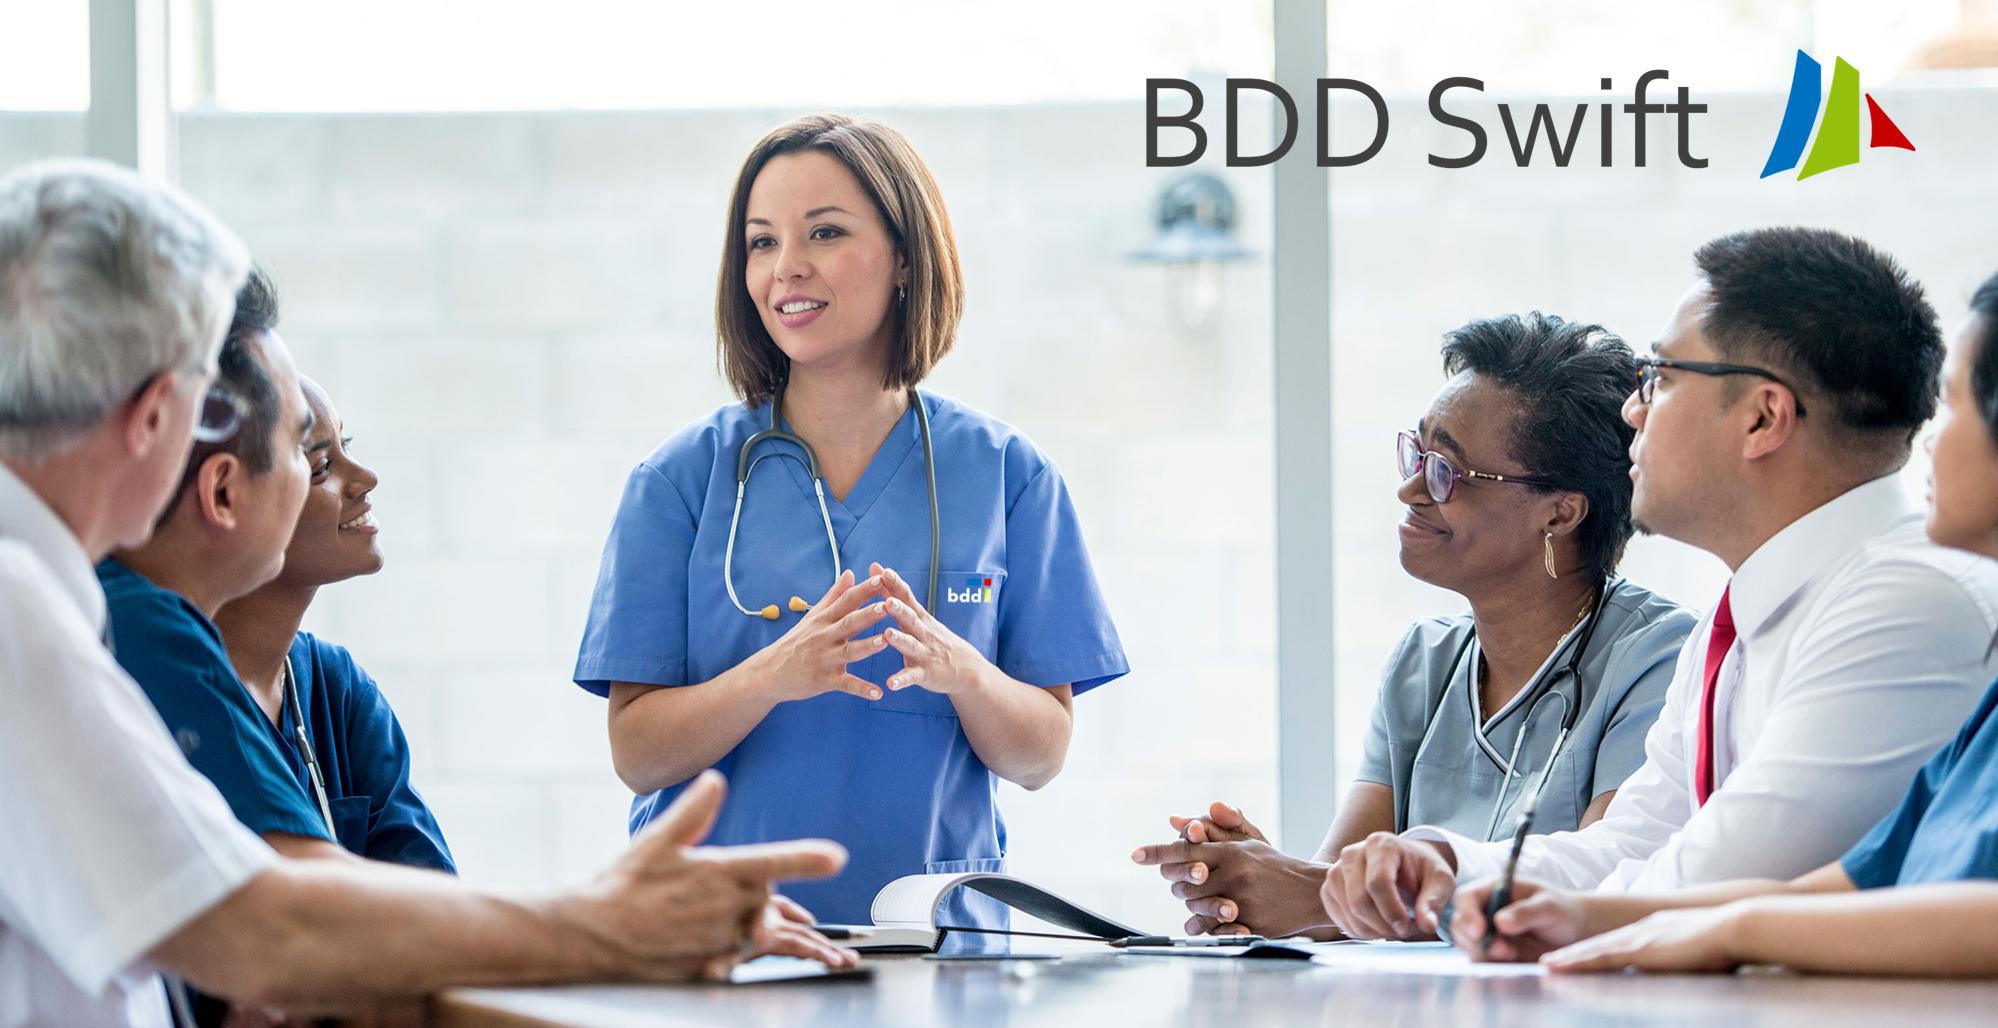 BDD Swift - adaptive clinical studies